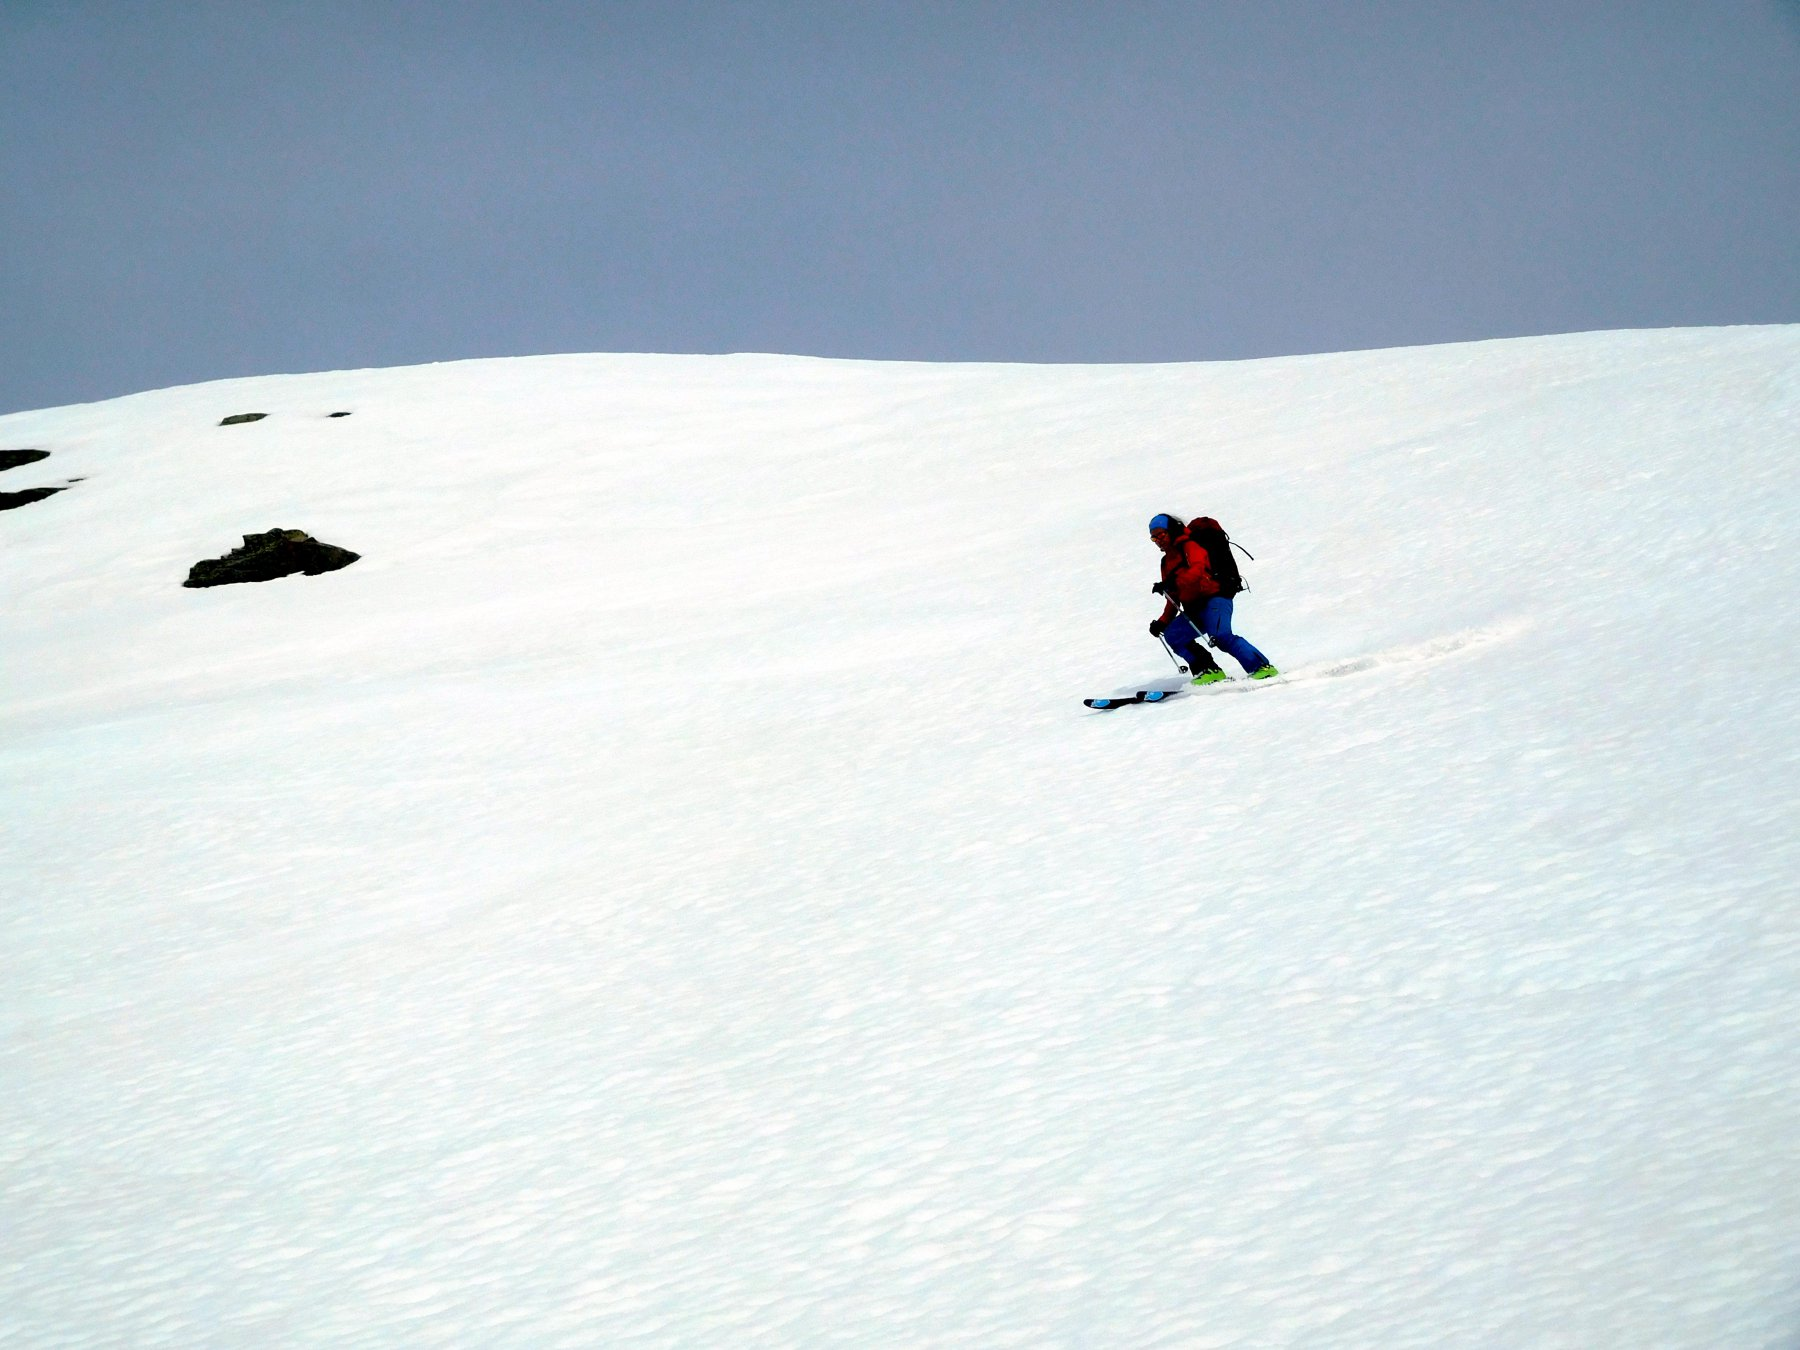 Elena si gode la neve primaverile